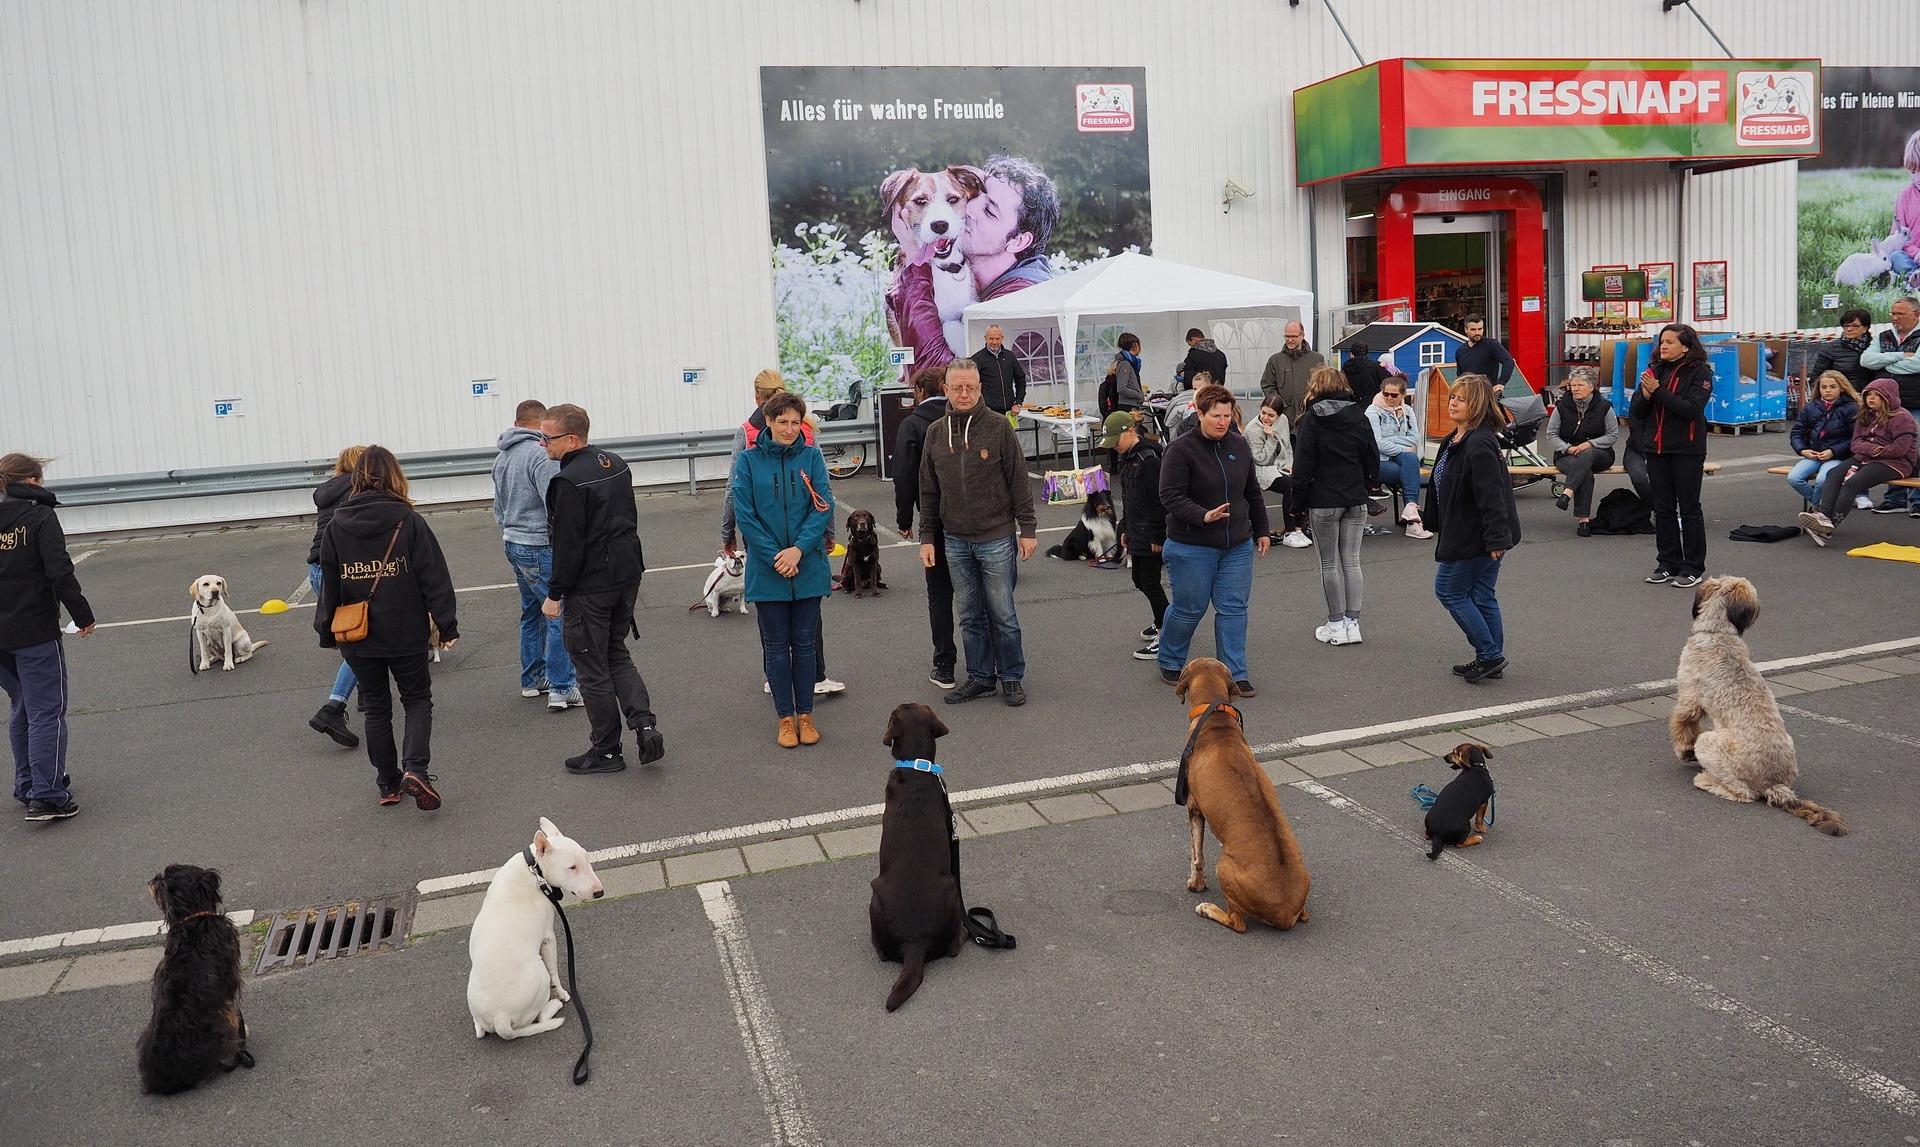 JoBaDog_Frühlingsfest_Fressnapf_Oranienburg_2019_12.jpg